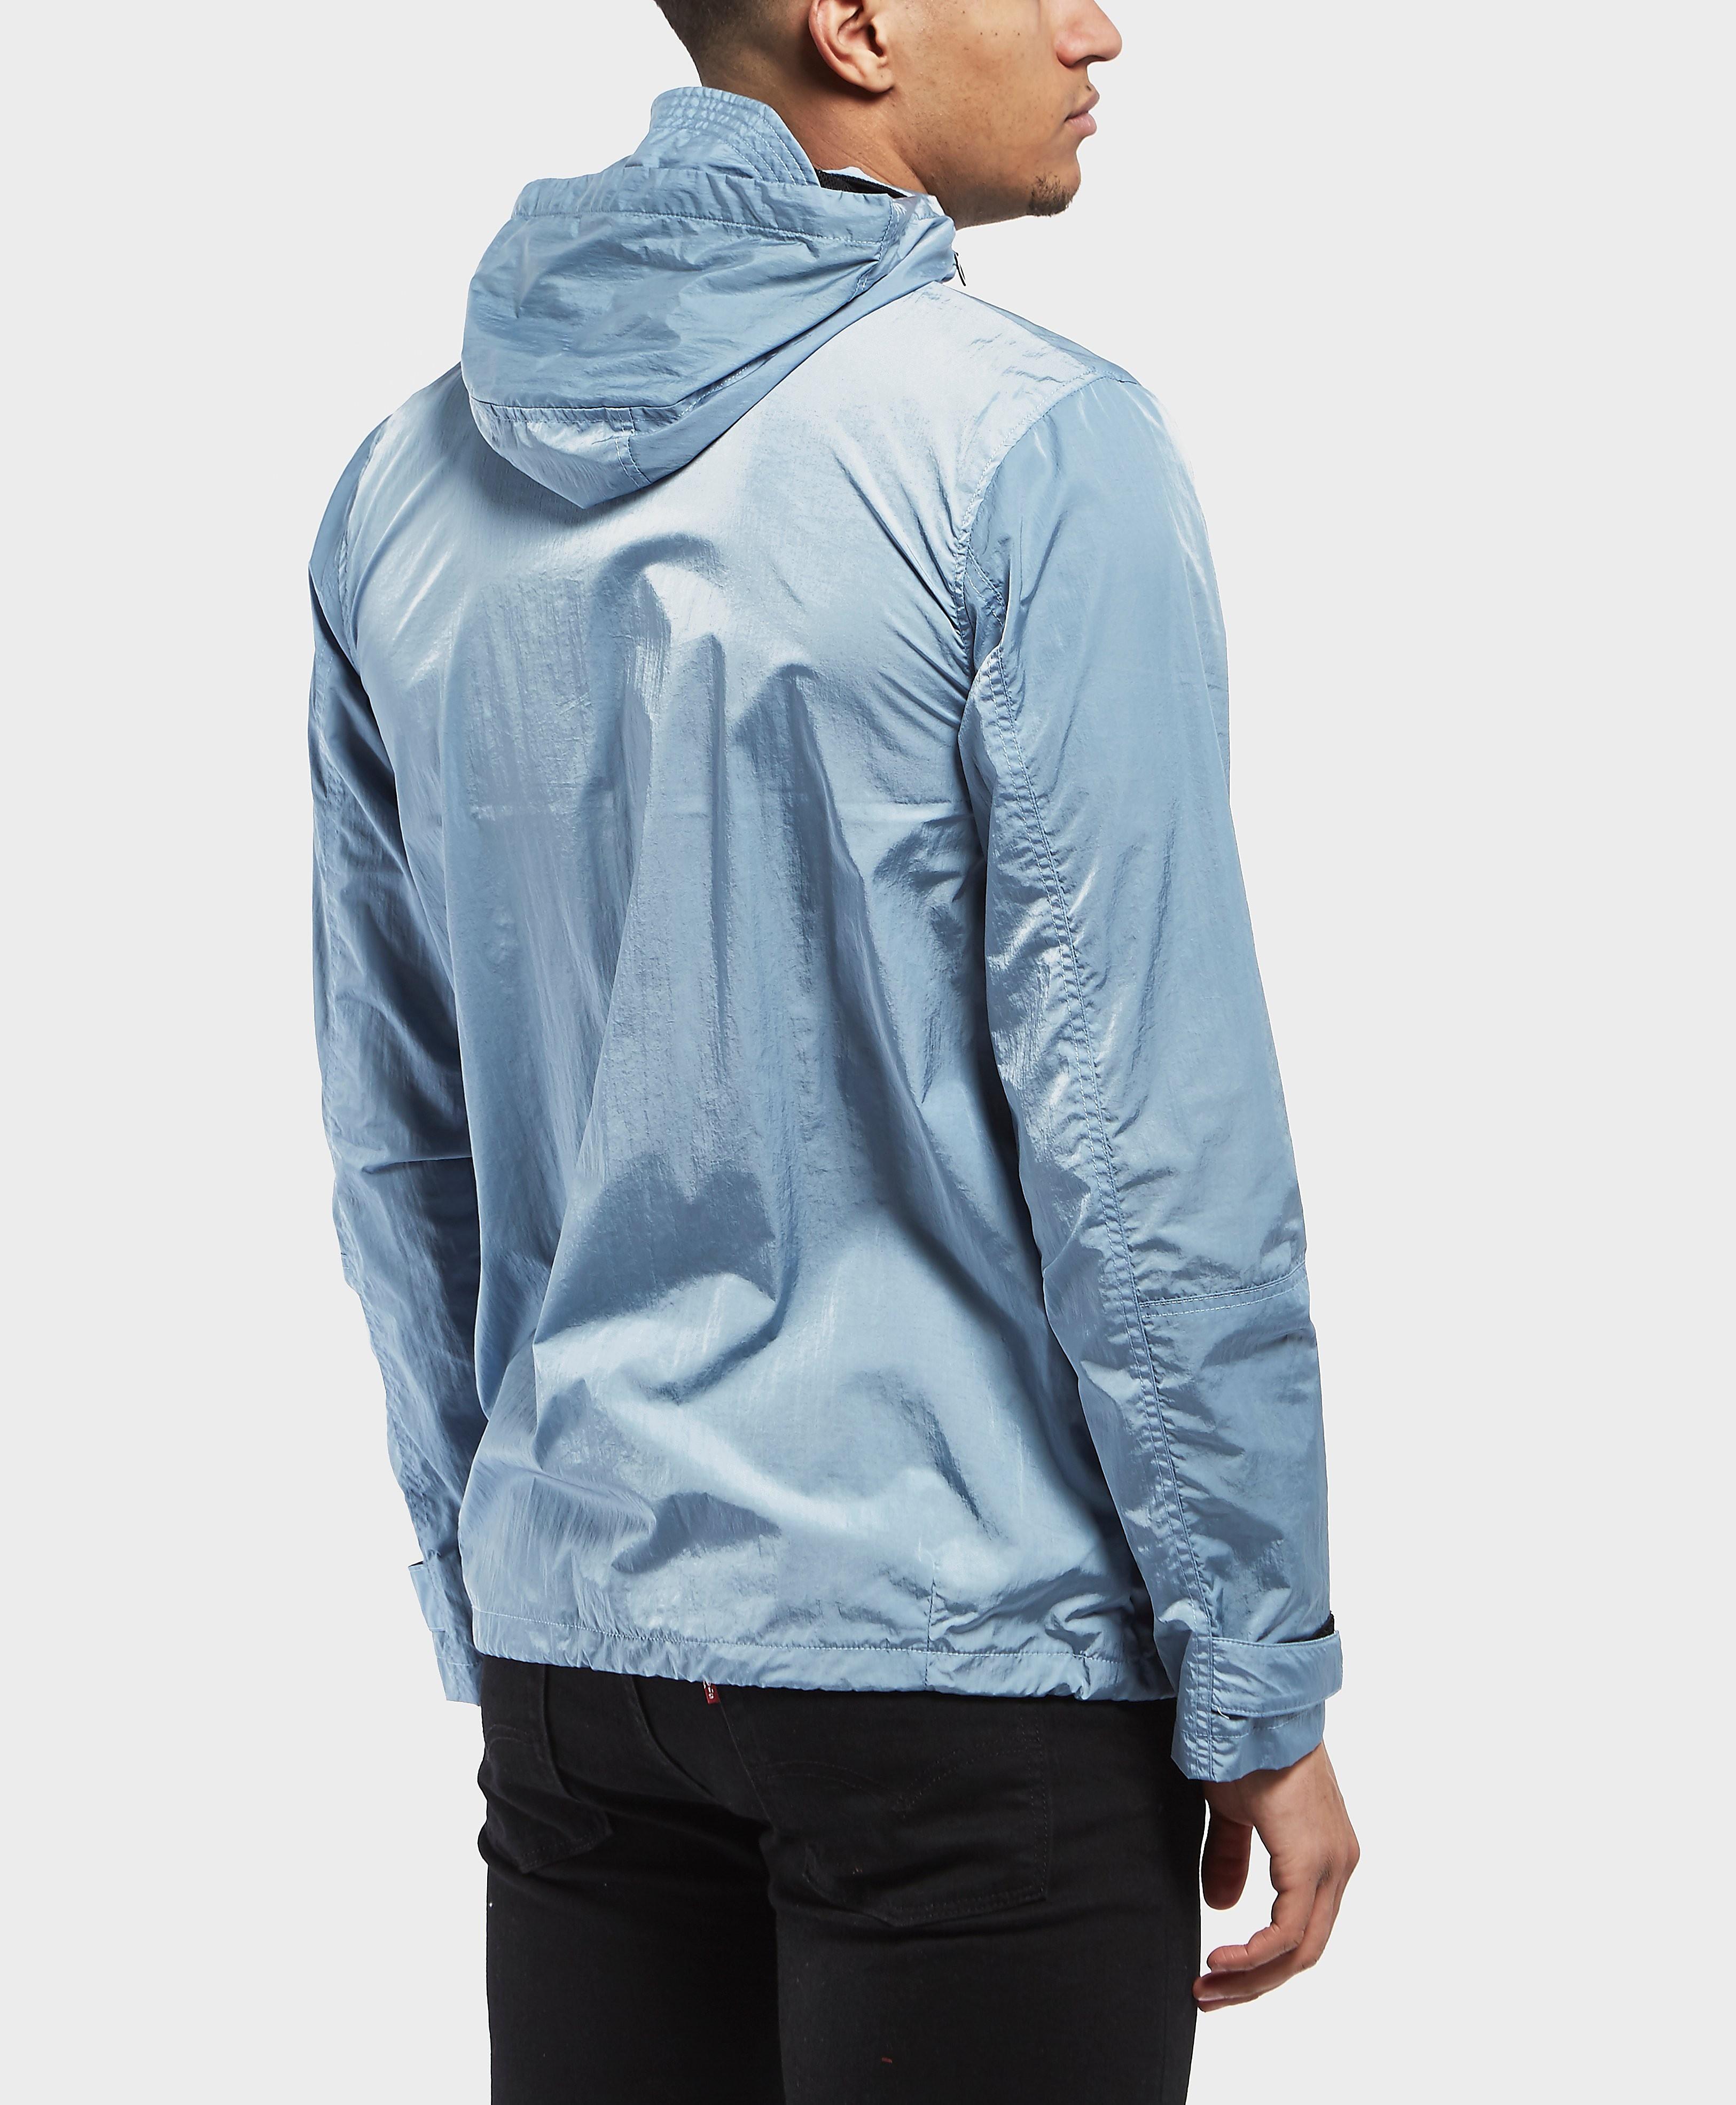 Marshall Artist Liquid Hooded Lightweight Overshirt